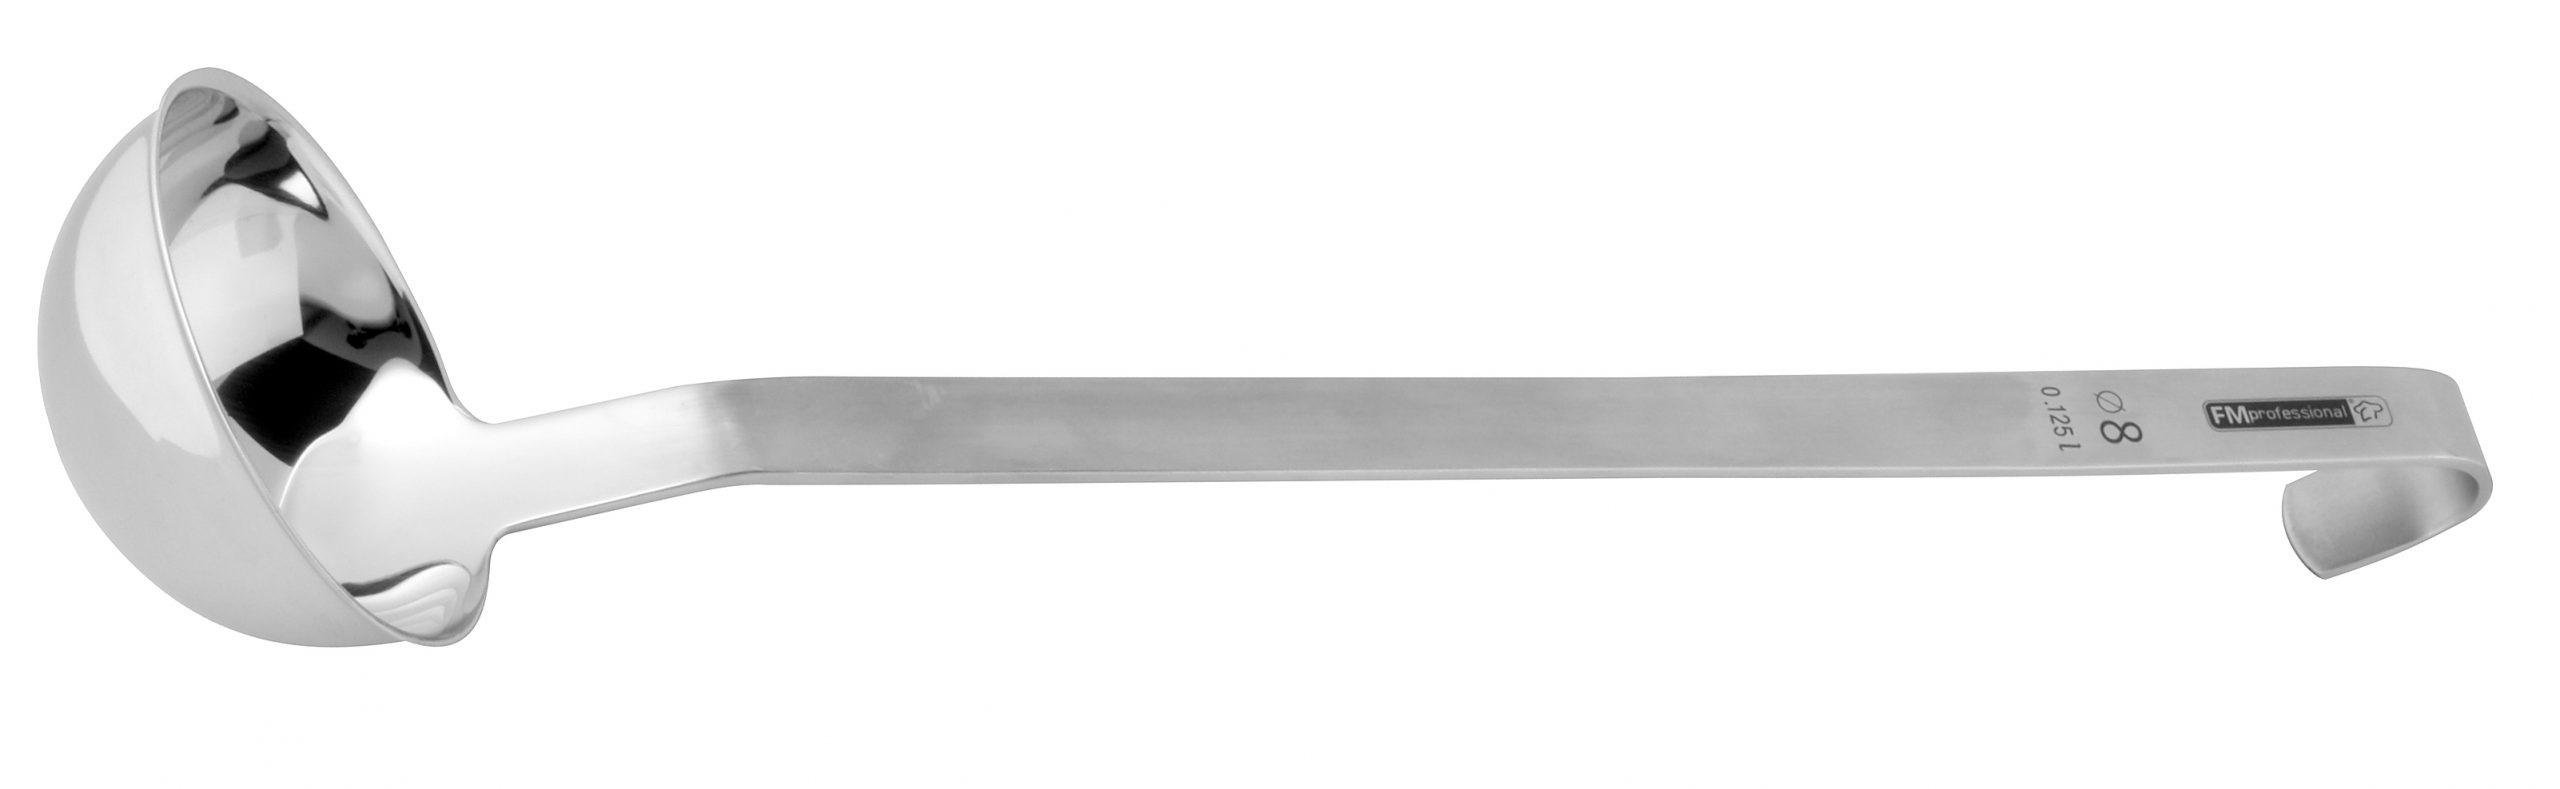 Schöpflöffel 12cl 39cm INOX